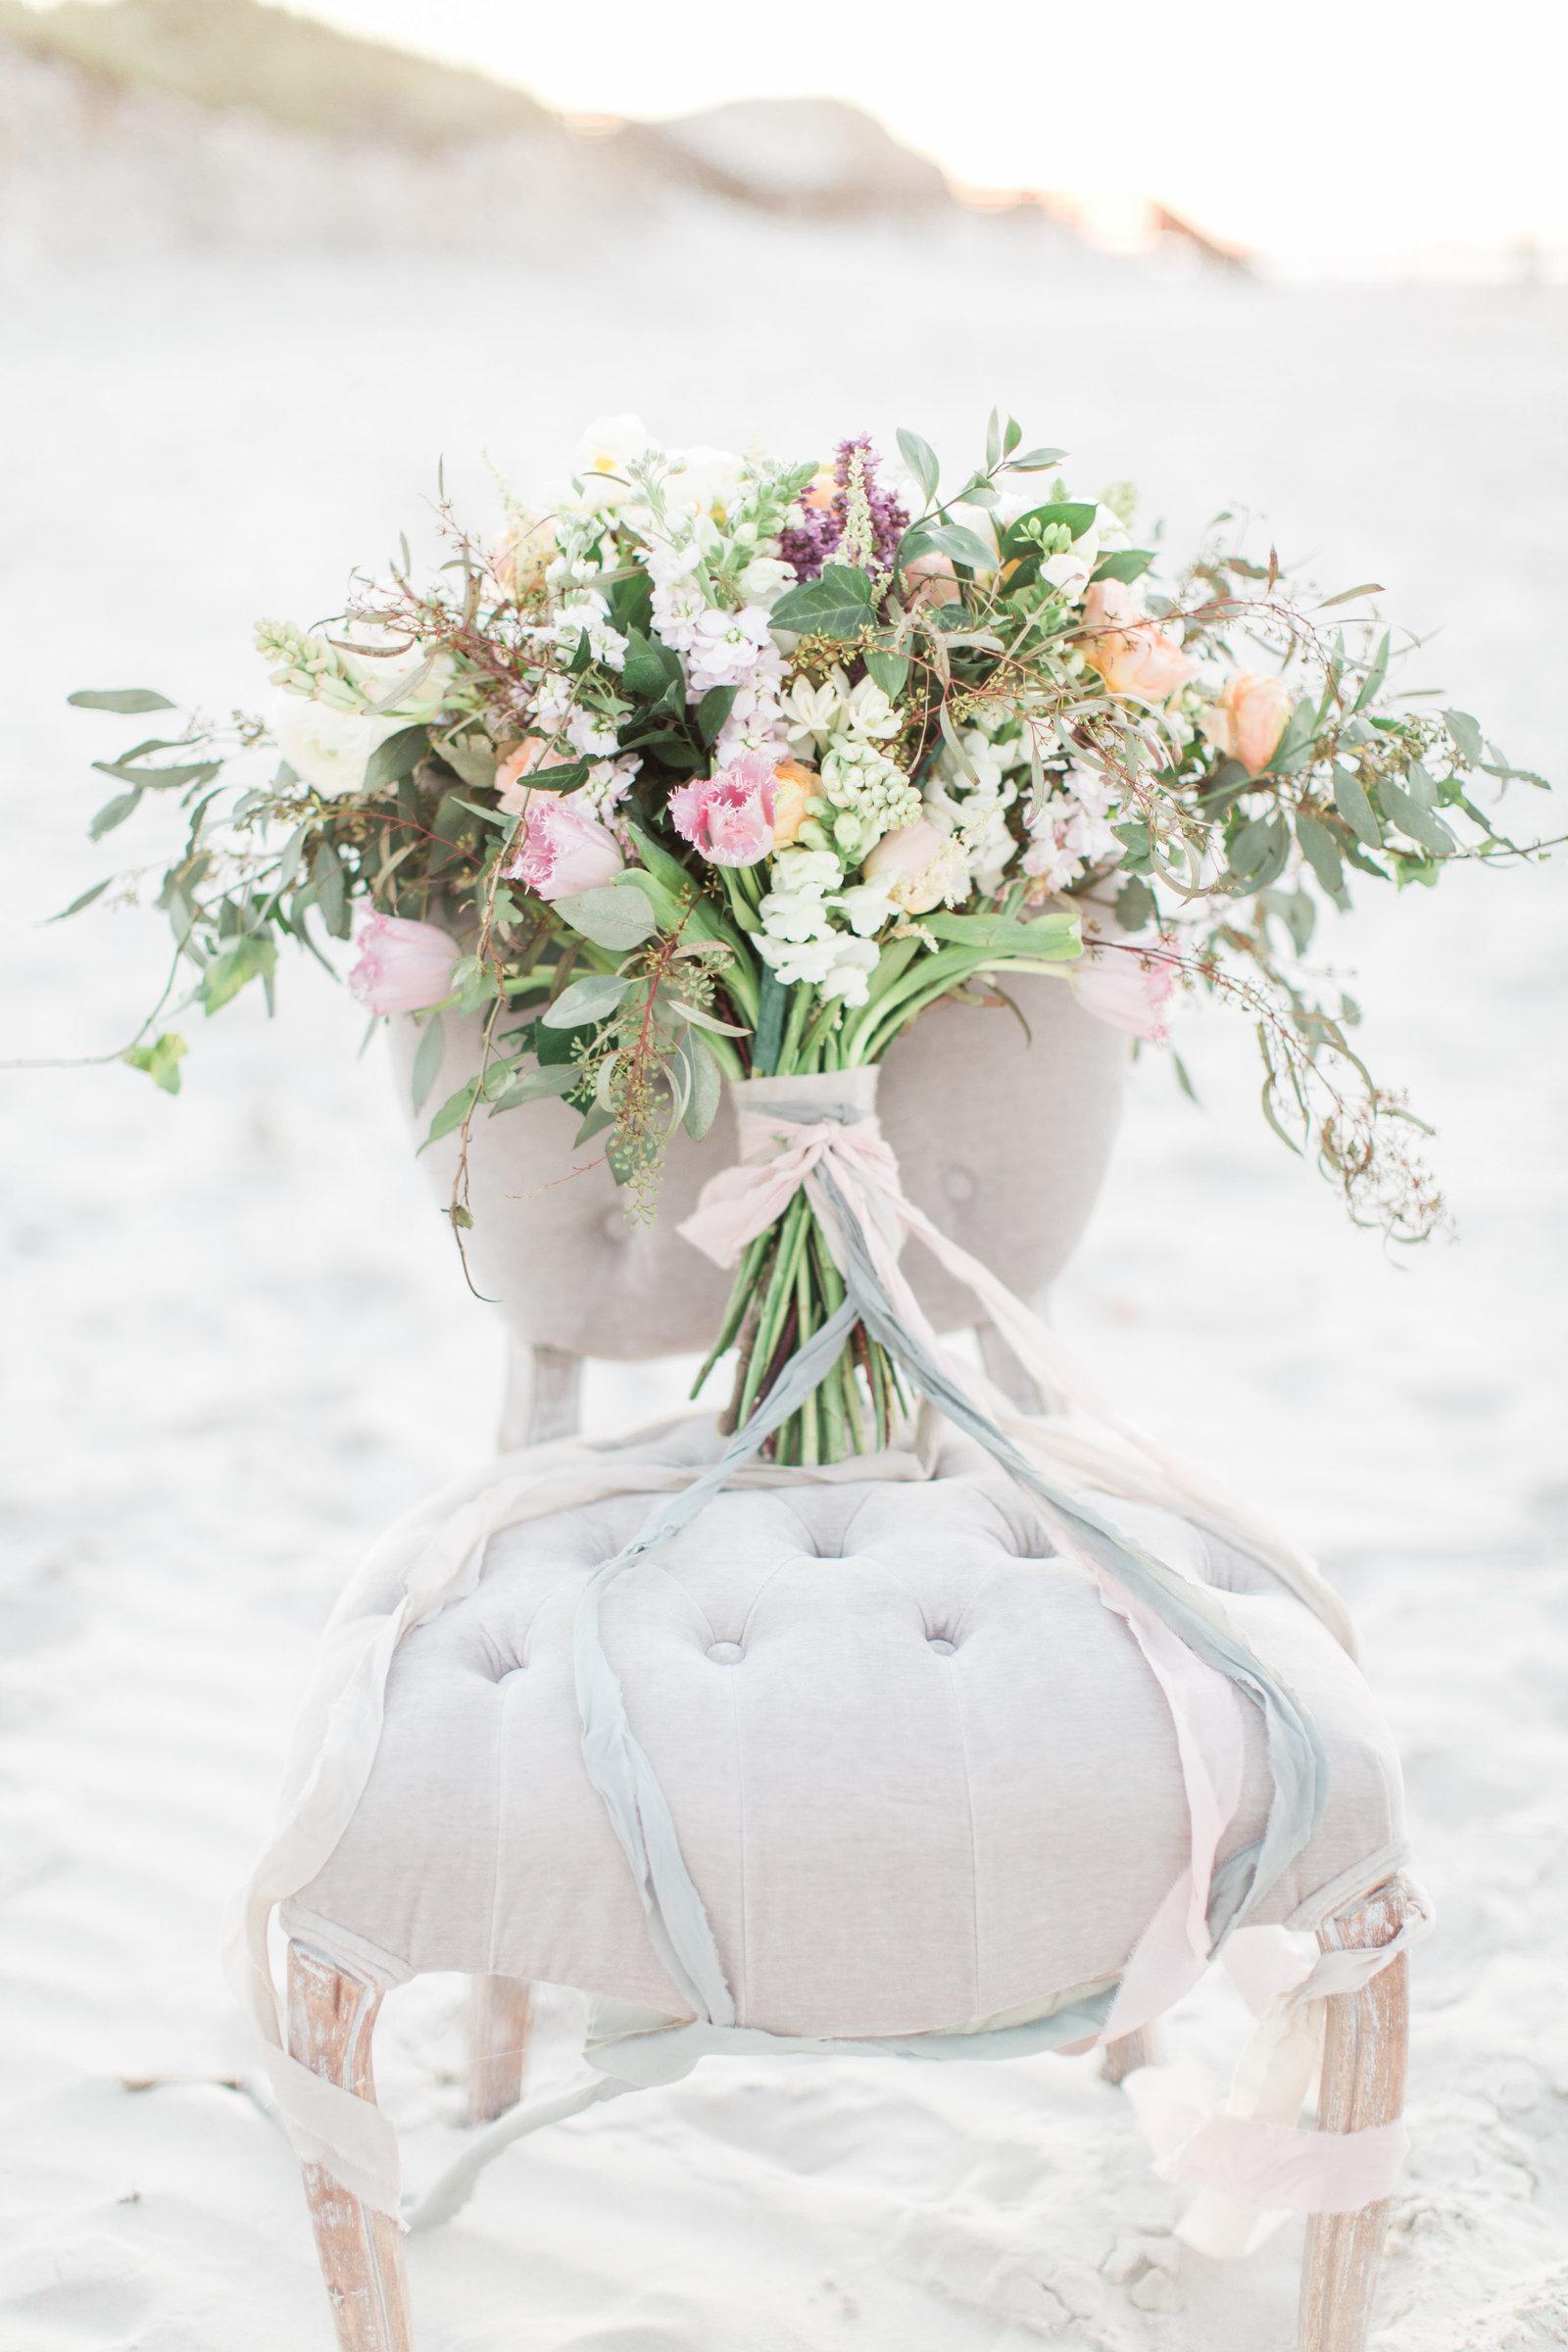 The Ultimate Wedding Planning Checklist | The HendricksThe Hendricks